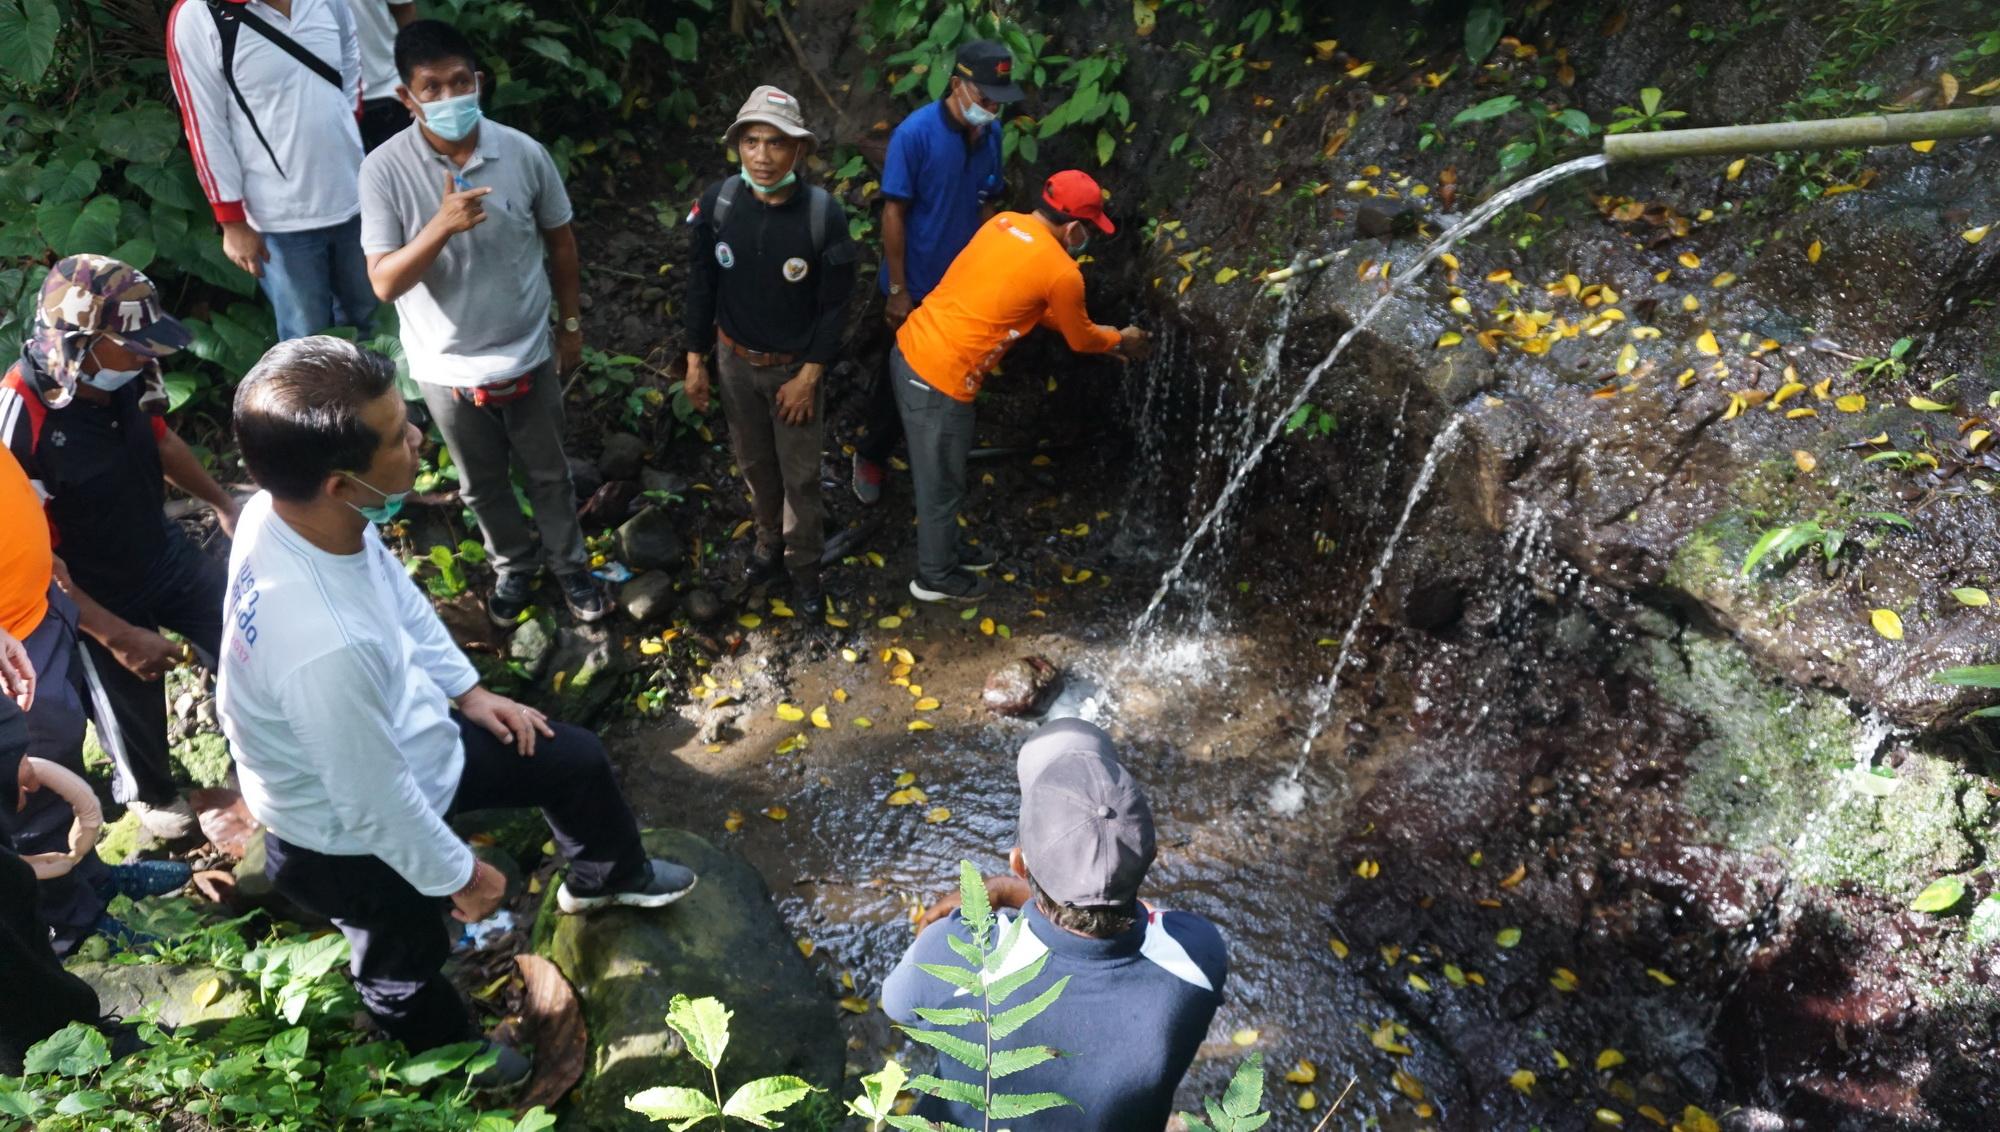 BUPATI Suwirta meninjau lokasi mata air di Desa Manduang, Minggu (13/12/2020). Foto: ist